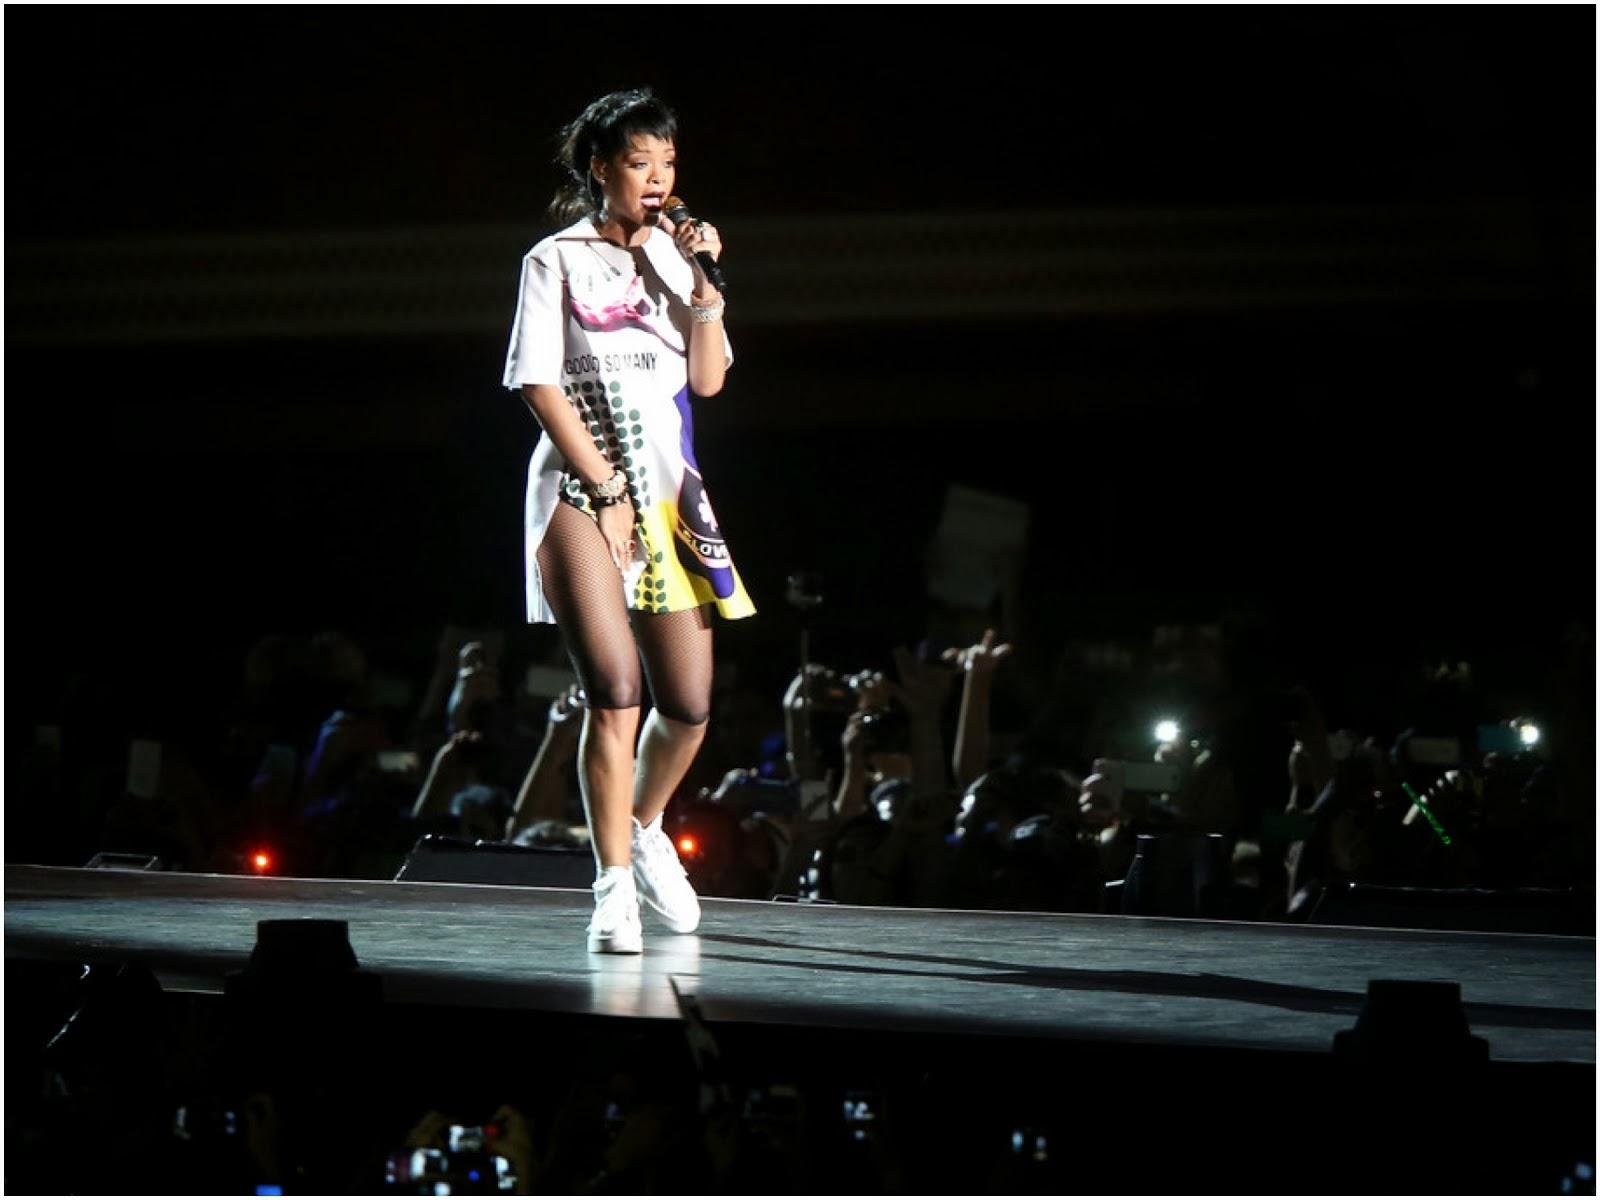 00o00 menswear blog: Rihanna in Raf Simons - Singapore F1 Grand Prix 2013